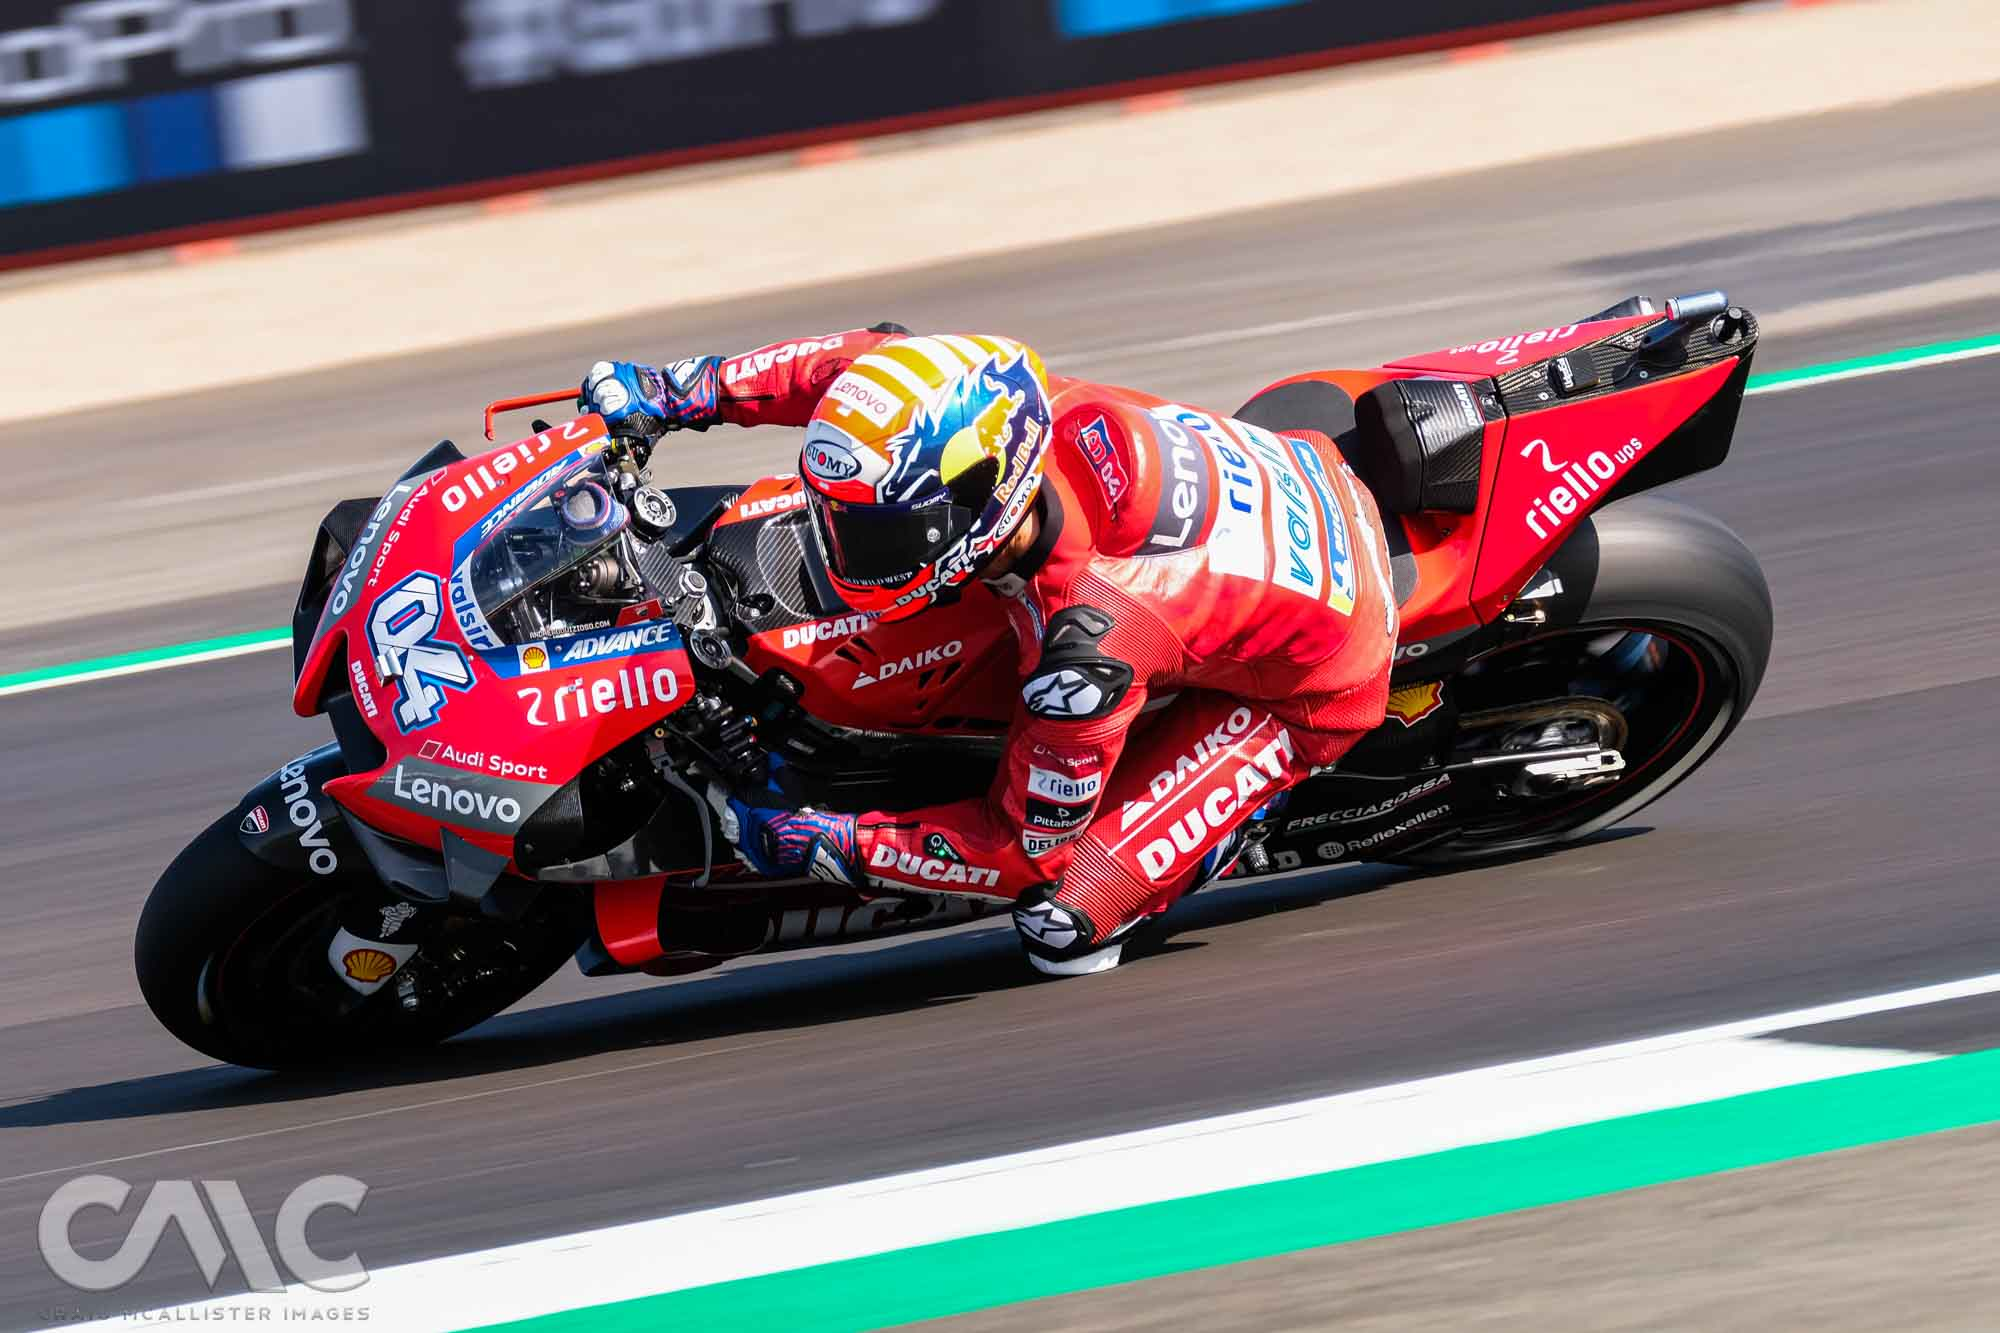 CMC_MotoGP_FP3_Silverstone 100-4004851.jpg